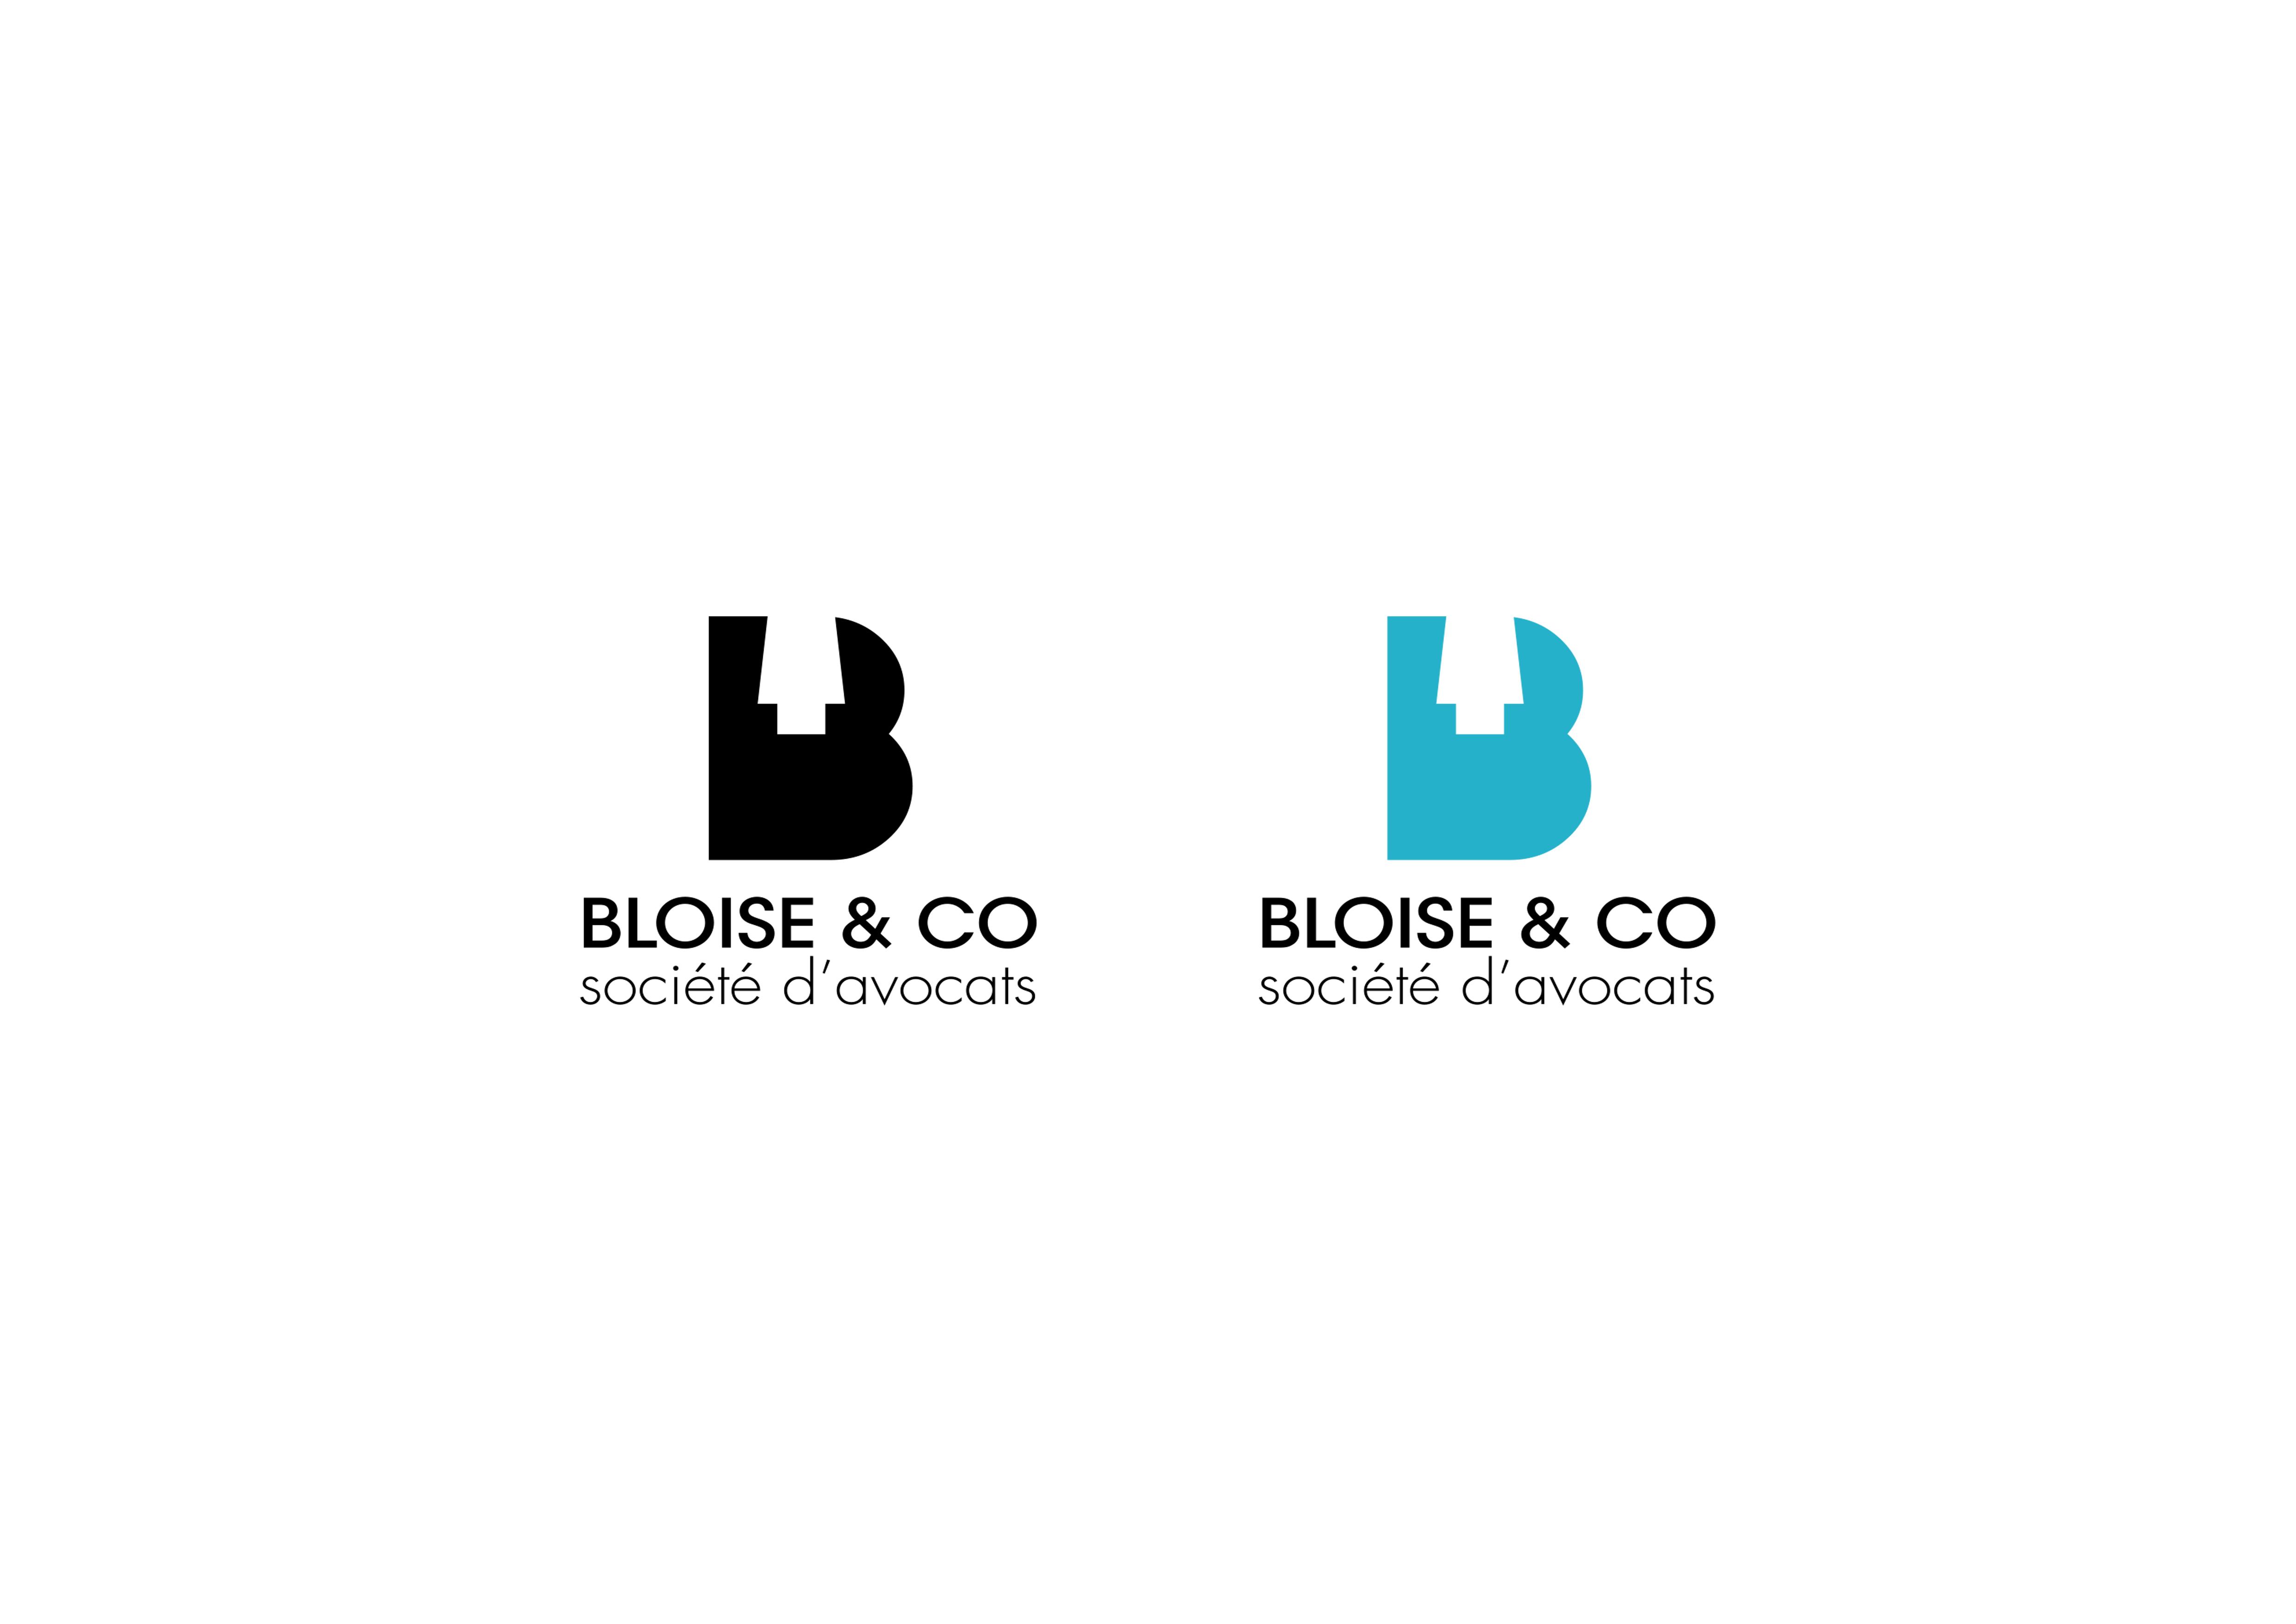 BOOKLET BLOISE & CO-LOGO-20-11-2018-V2-5